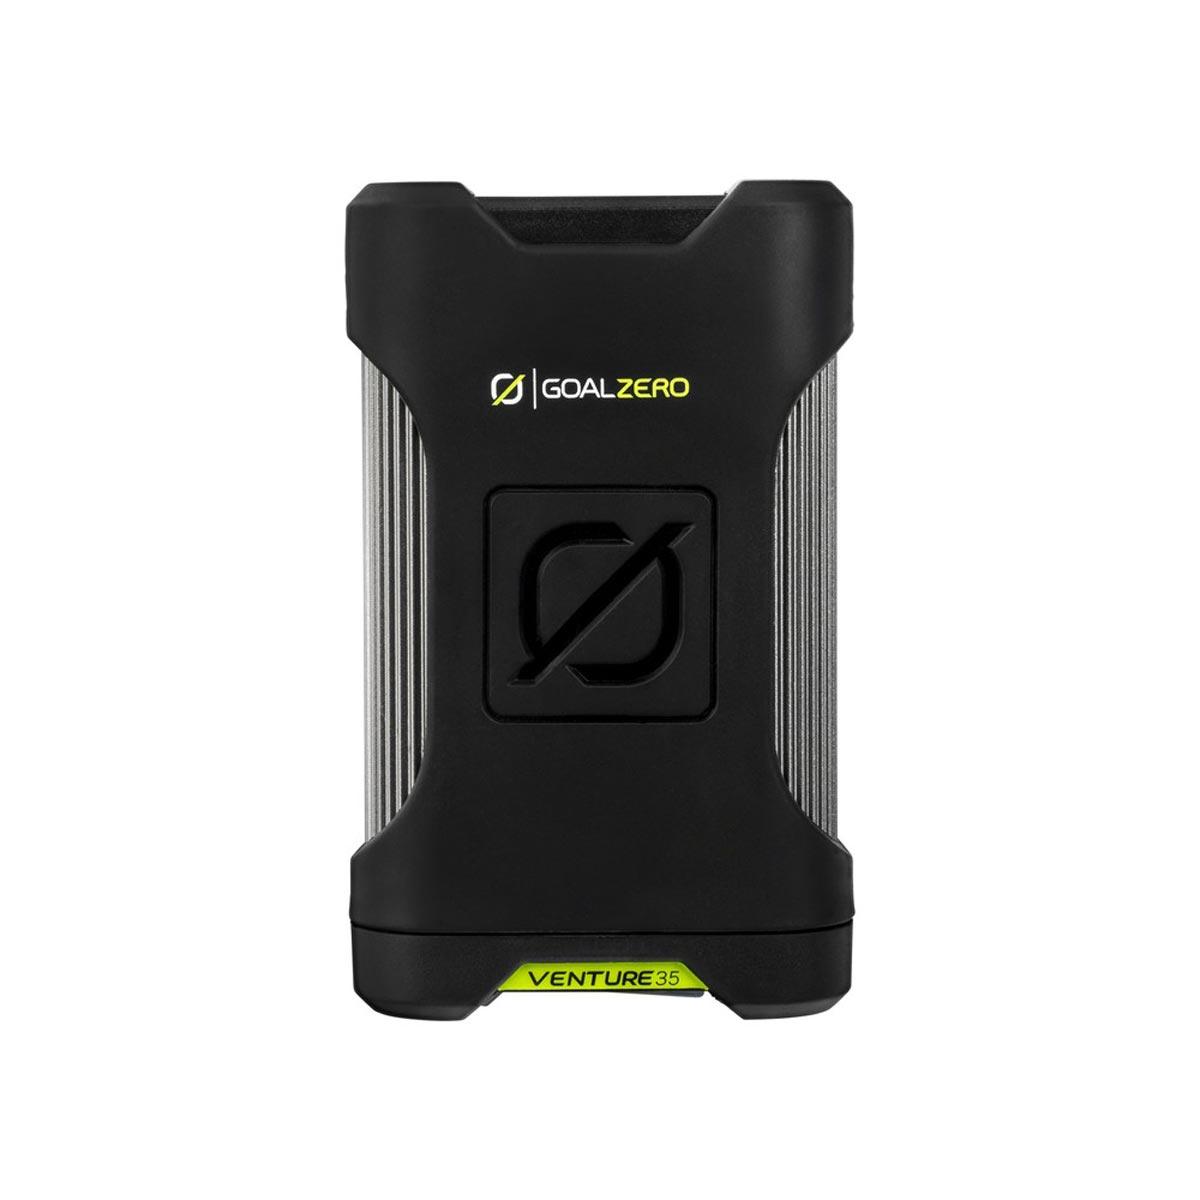 Goal Zero Venture 35 Power Bank 9,600 mAh Portable Charger